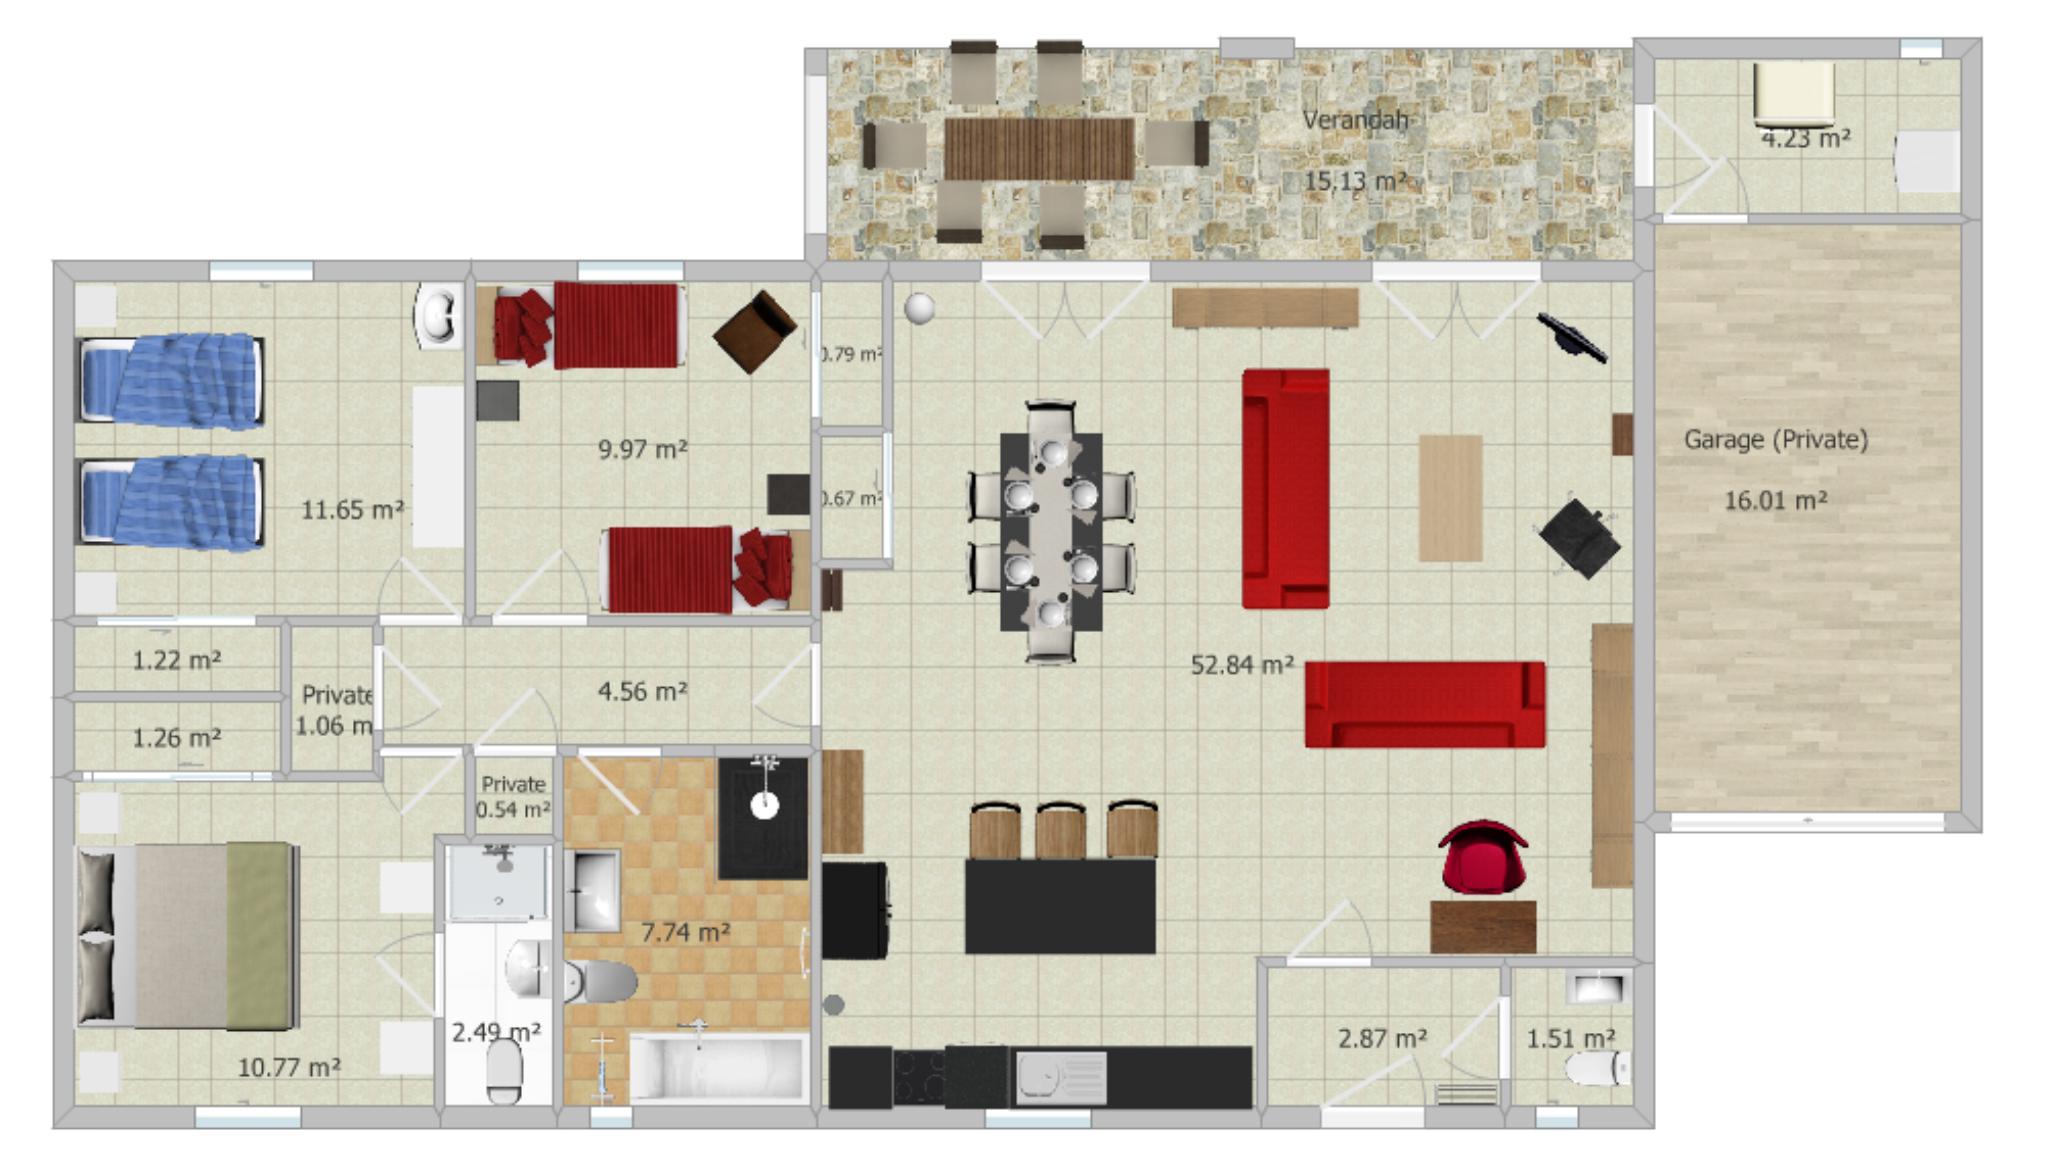 Floor plan of Villa Mimarmel